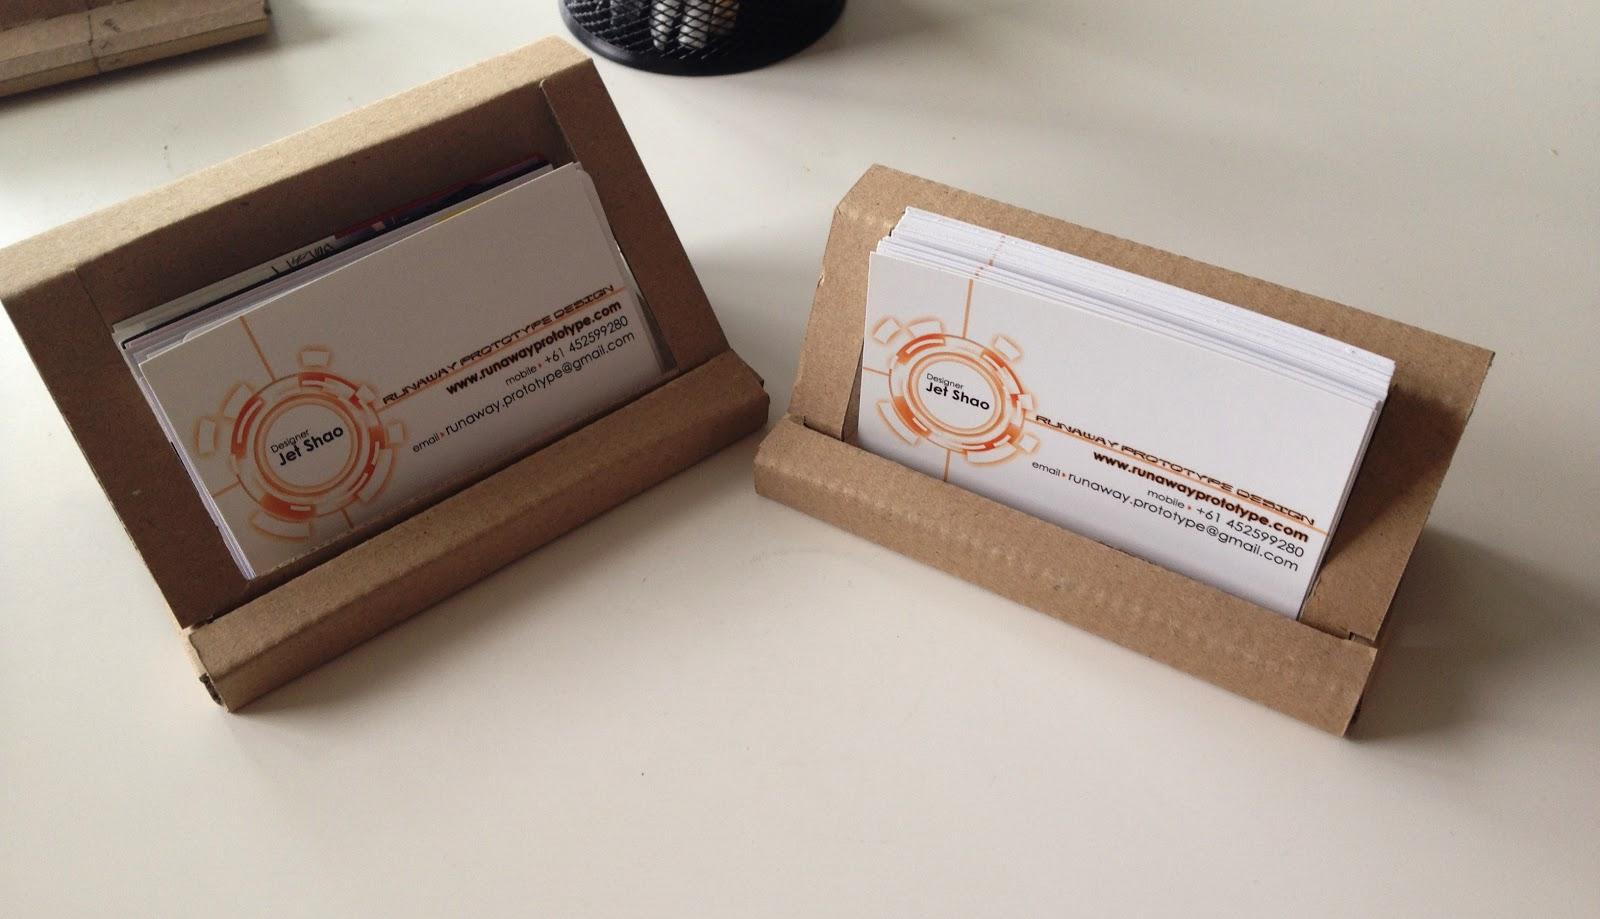 Cardboard Business Card Dispenser | Best Business Cards